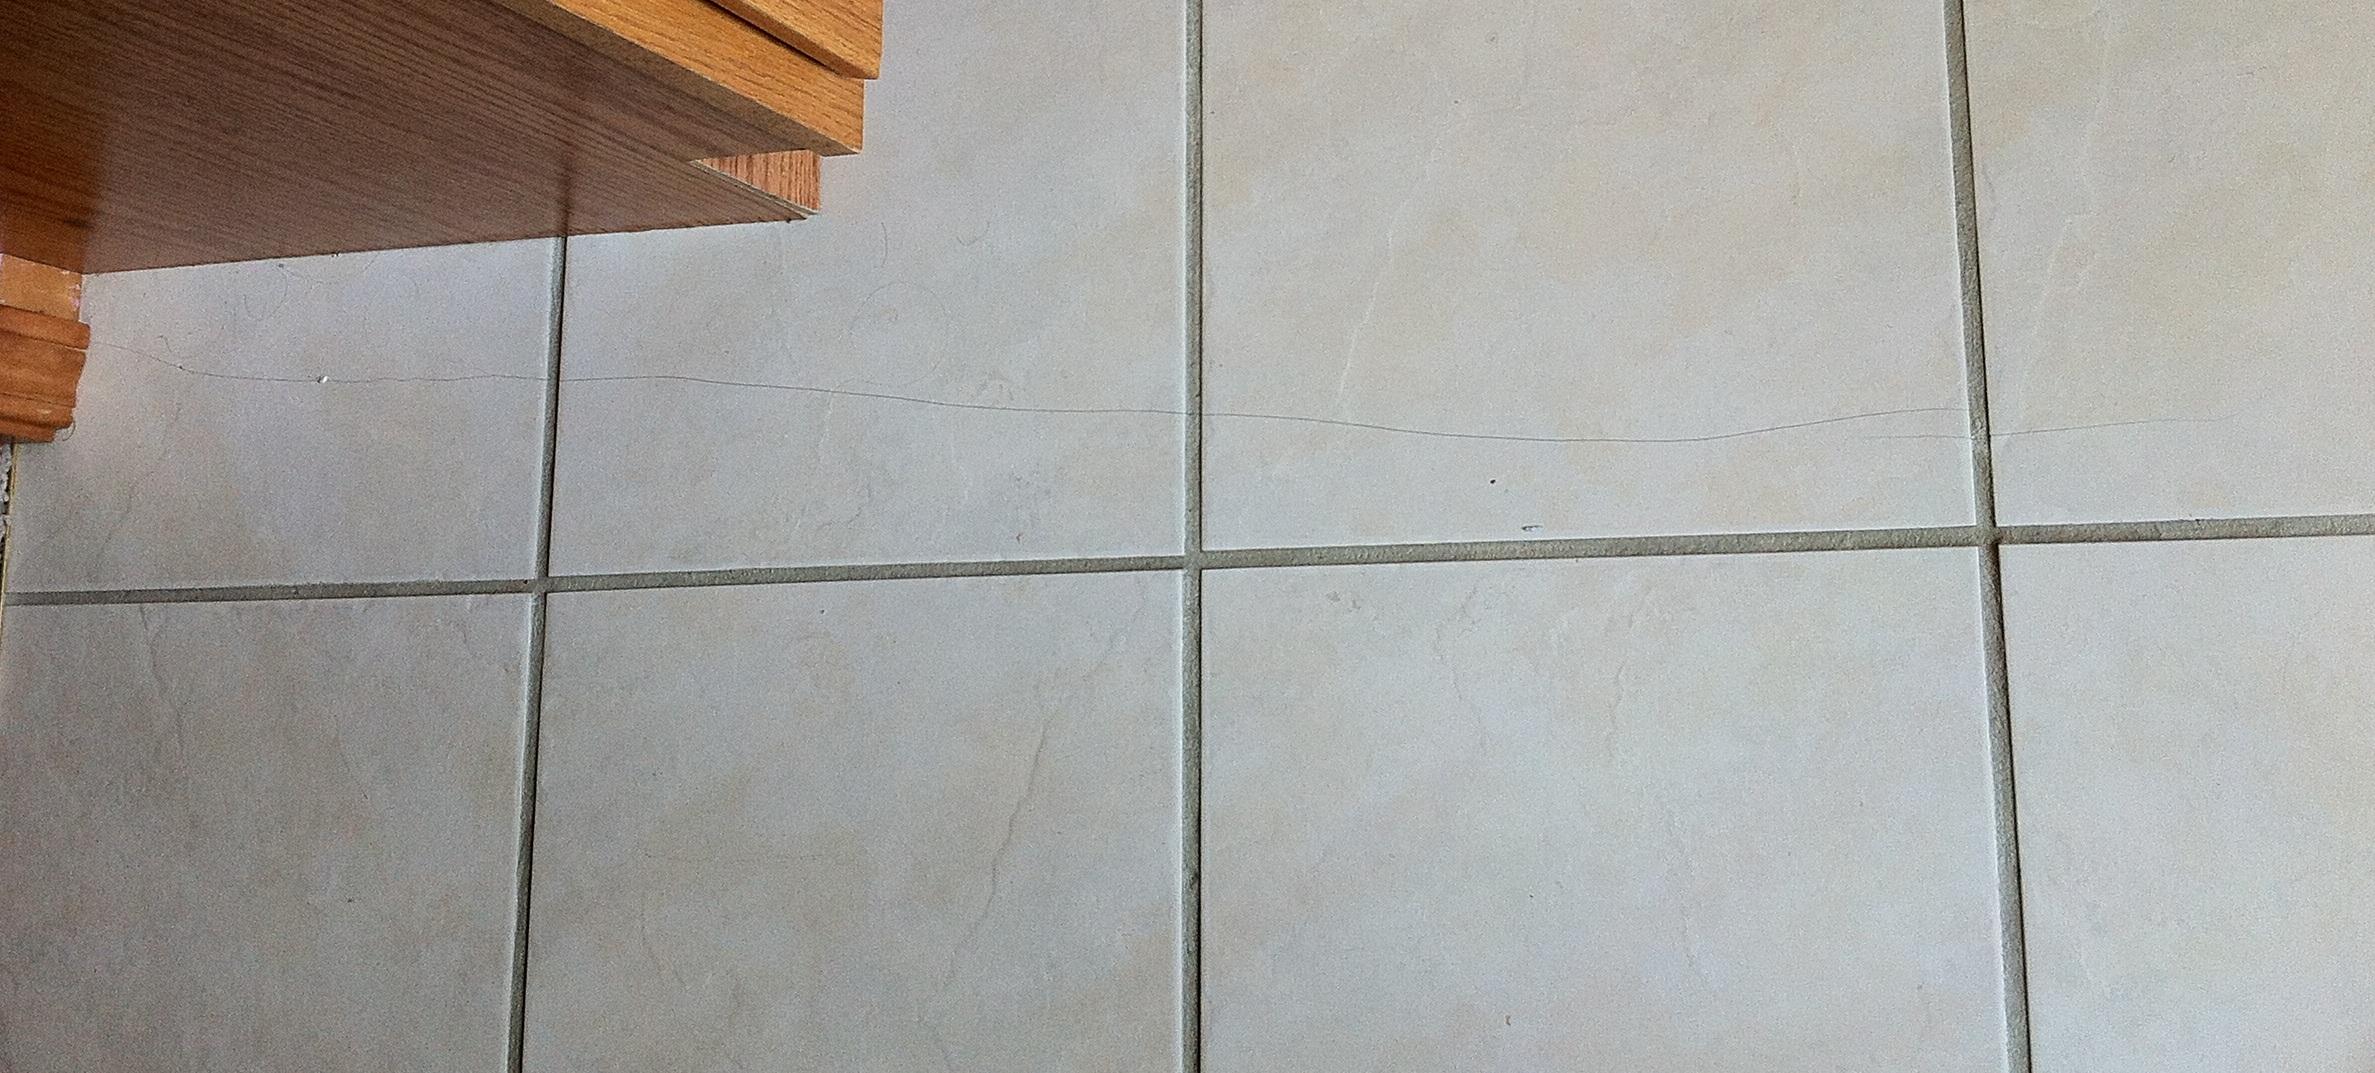 cracked tile in bathroom